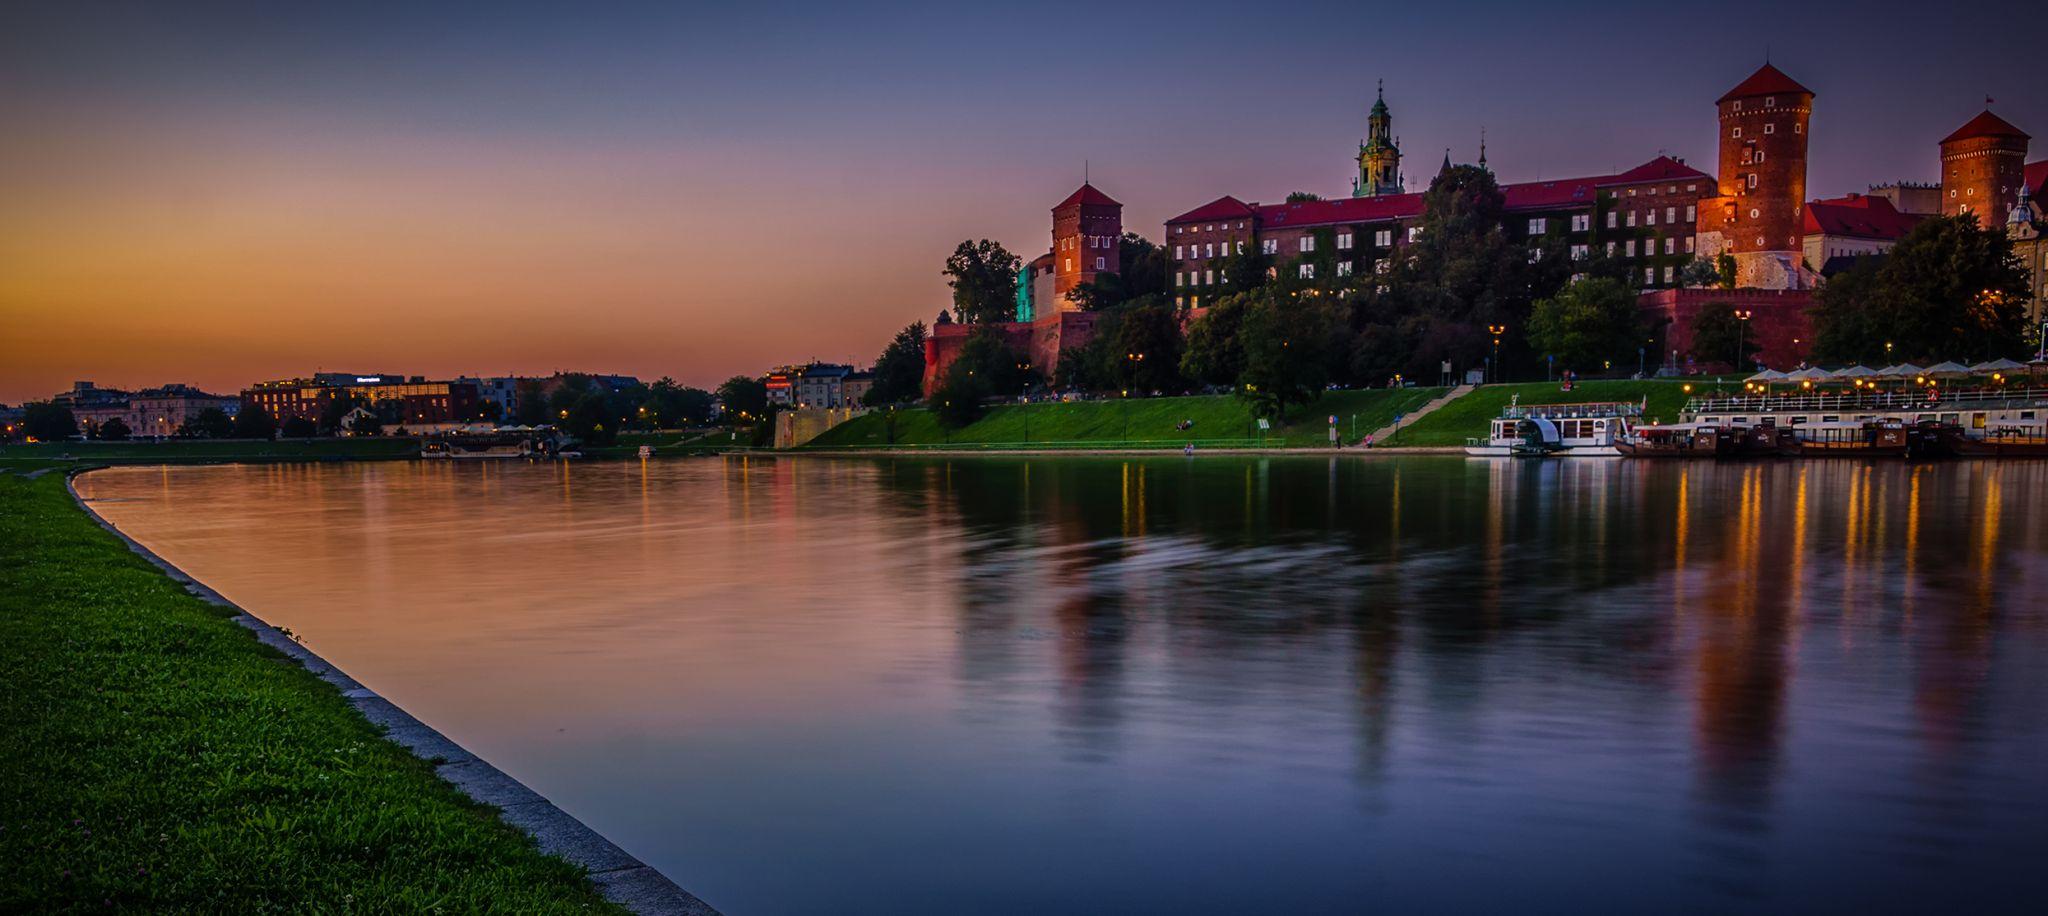 Wawwel Castle, Poland